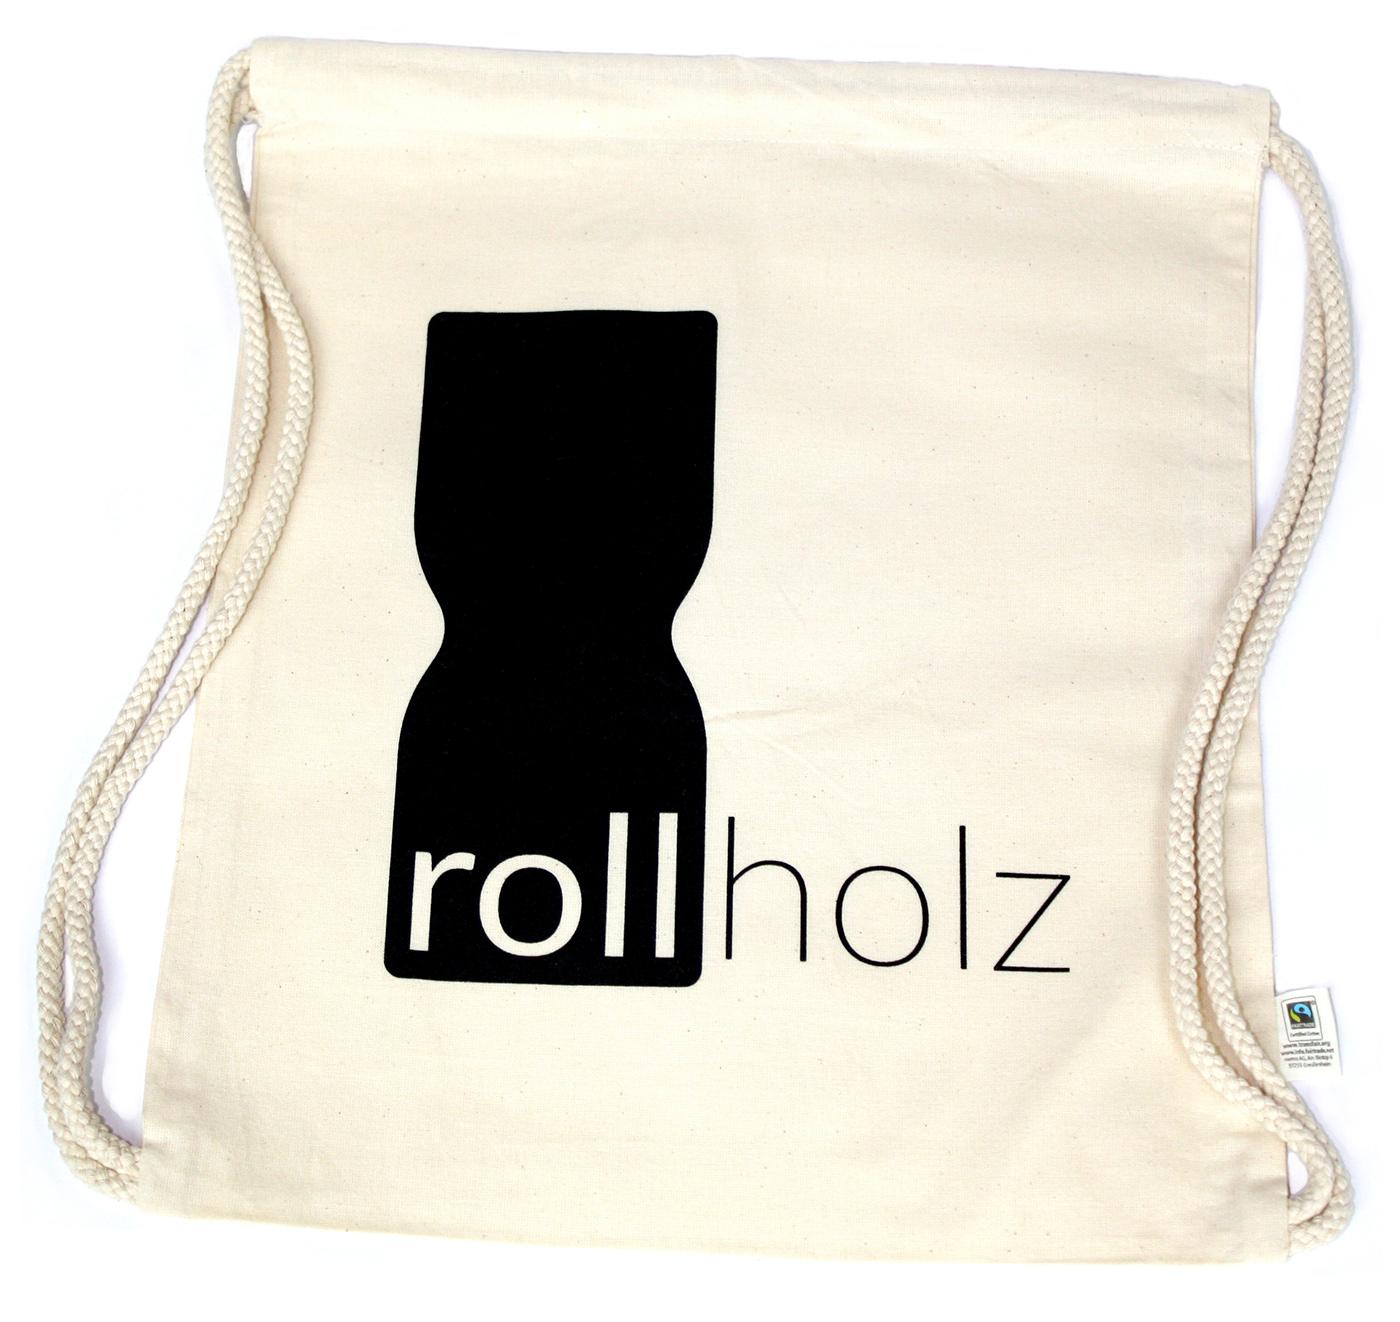 rollholz Fairtrade Bio-Baumwollbeutel